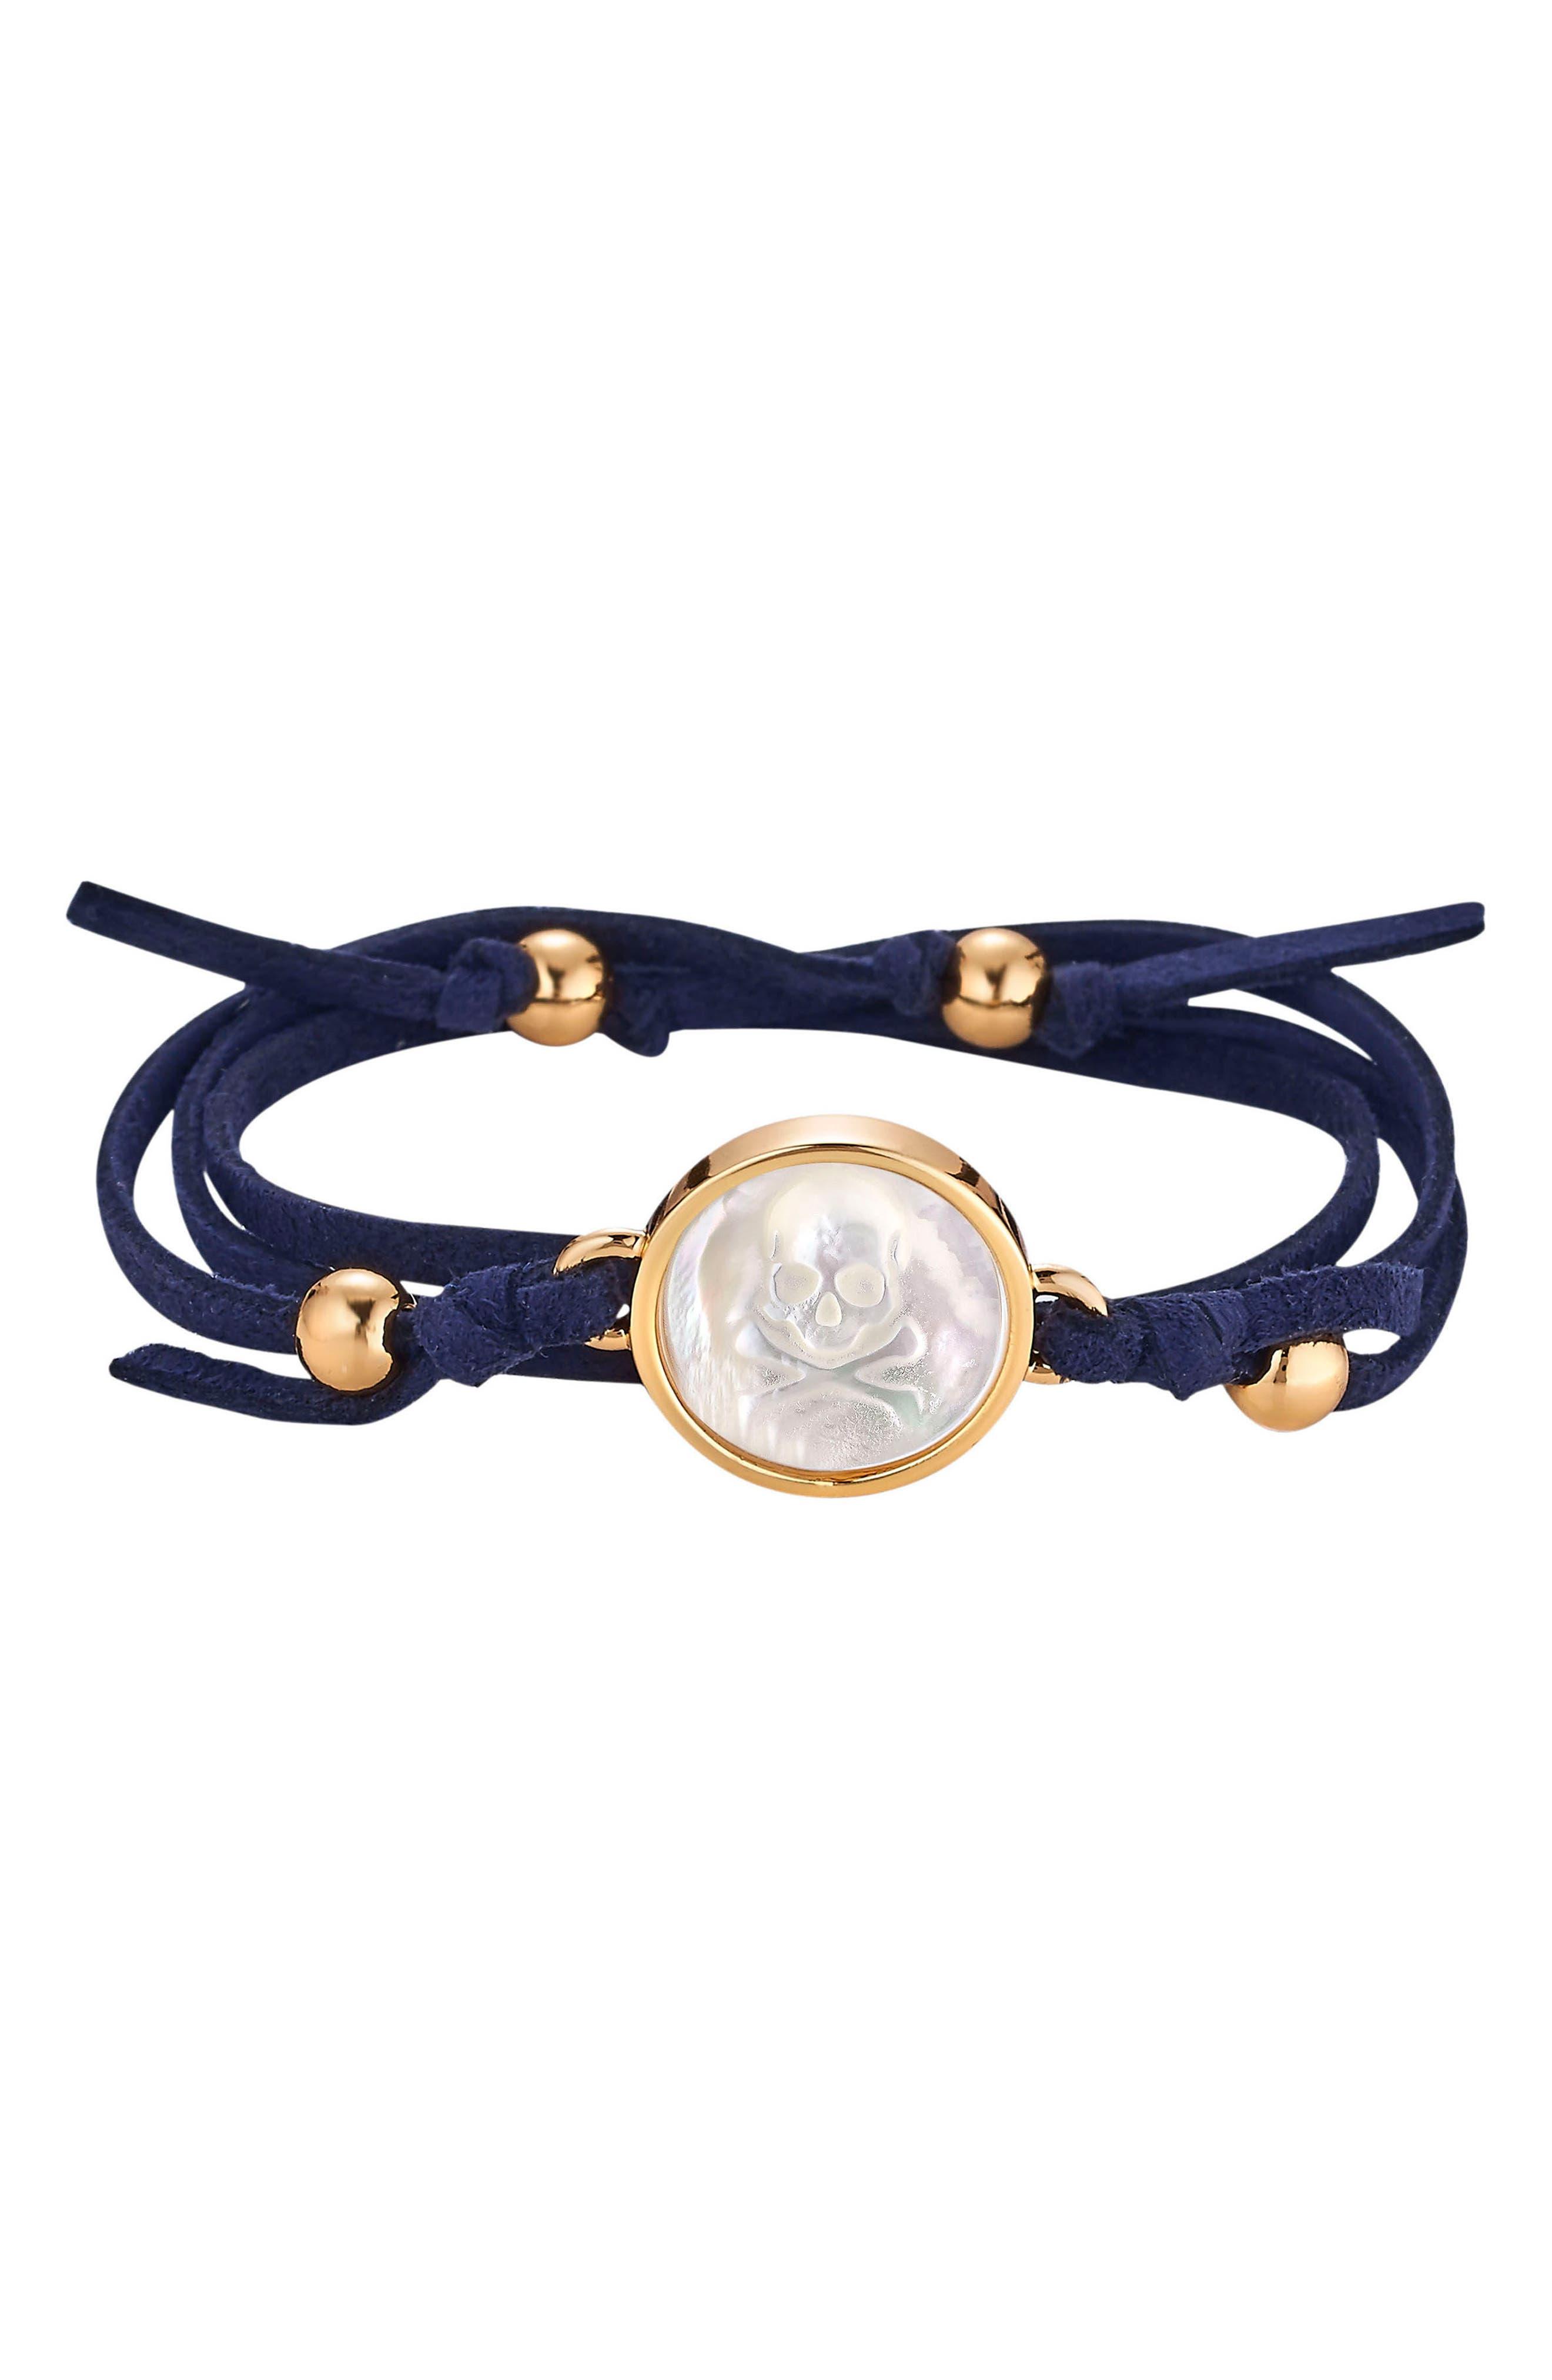 Skull & Bones Suede Wrap Bracelet,                         Main,                         color, NAVY BLUE SKULL